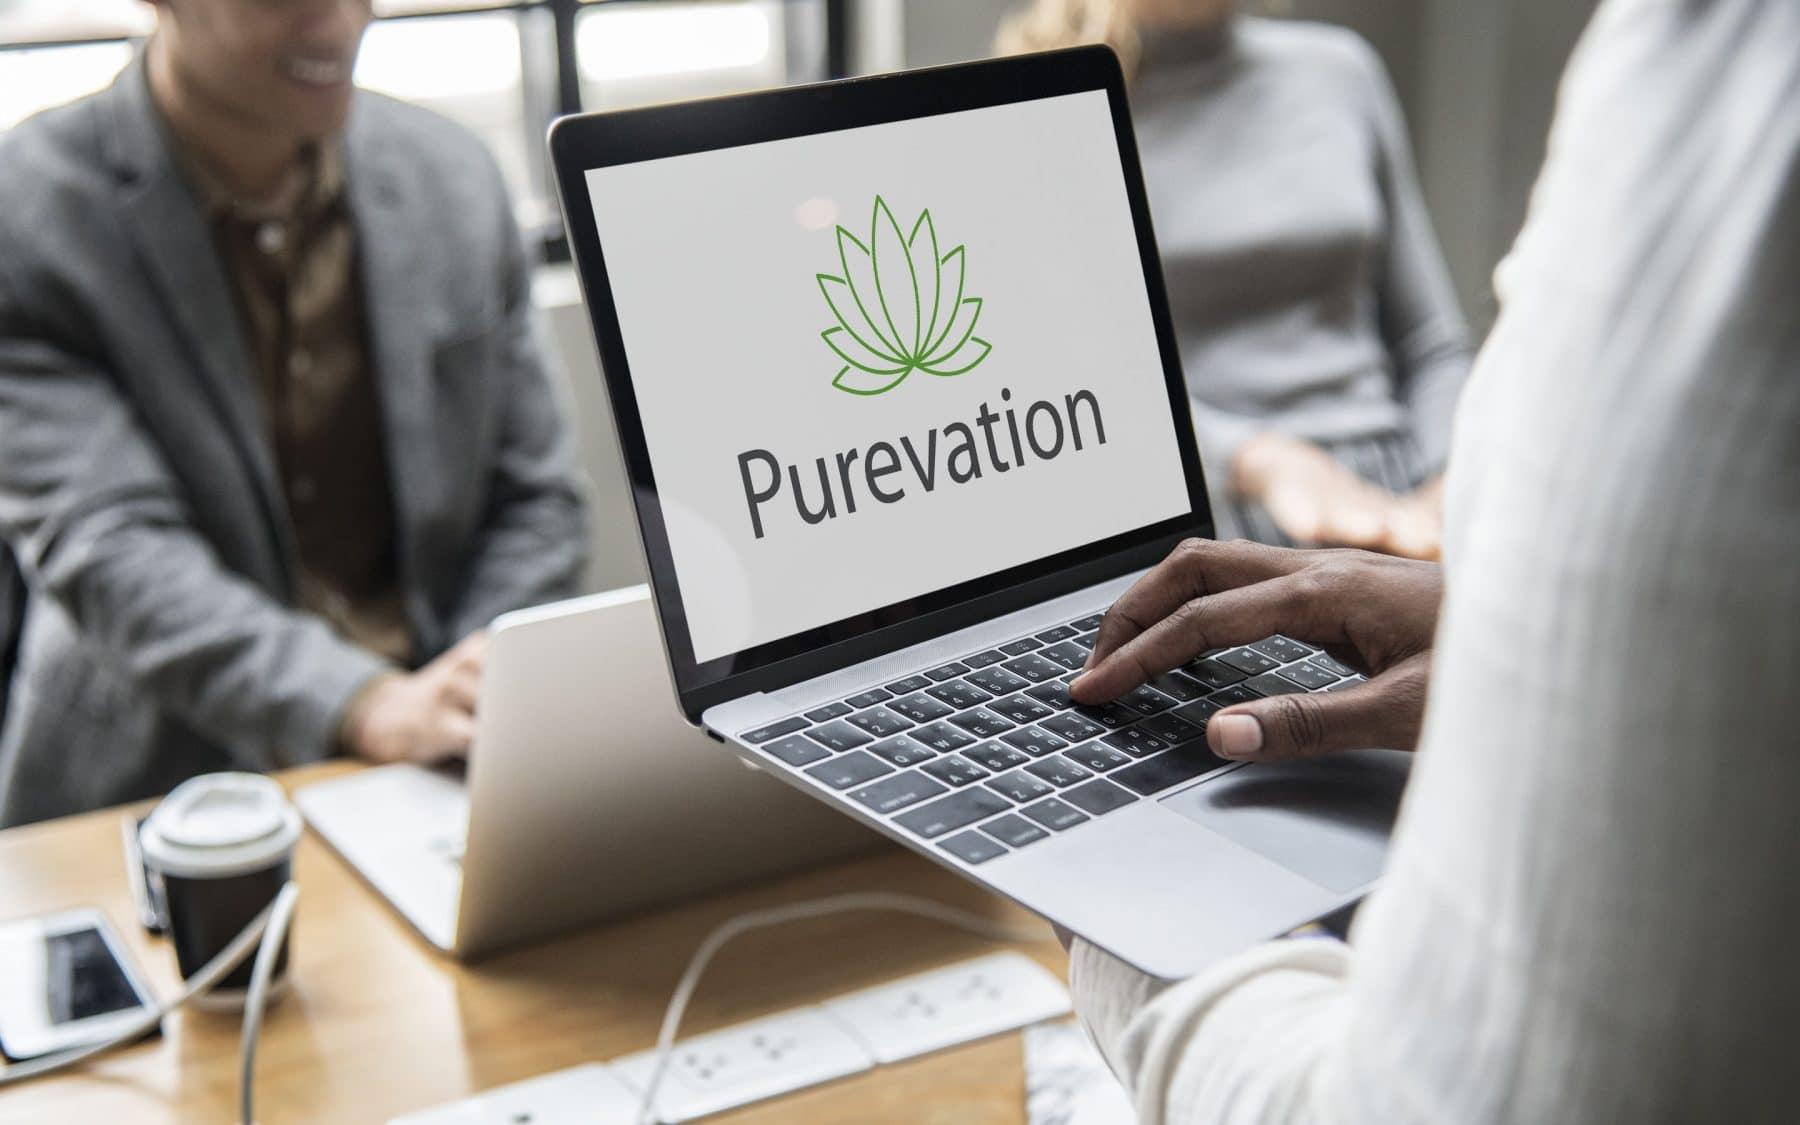 Purevation 2